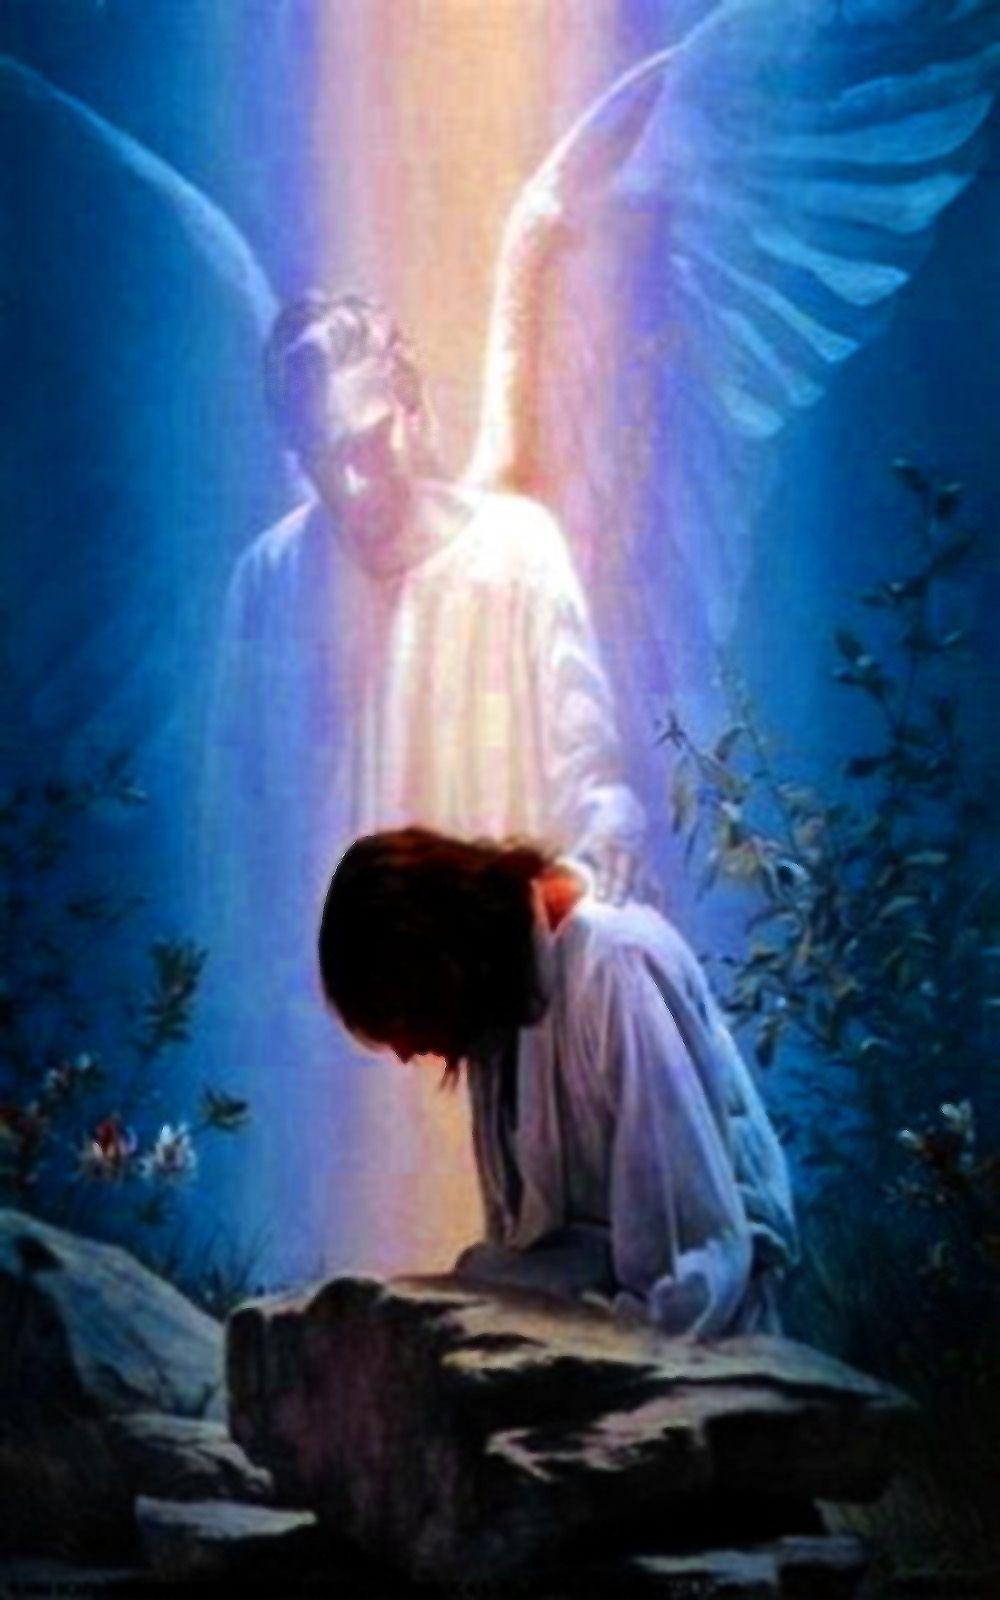 File:Angel prayers.jpg - Wikimedia Commons